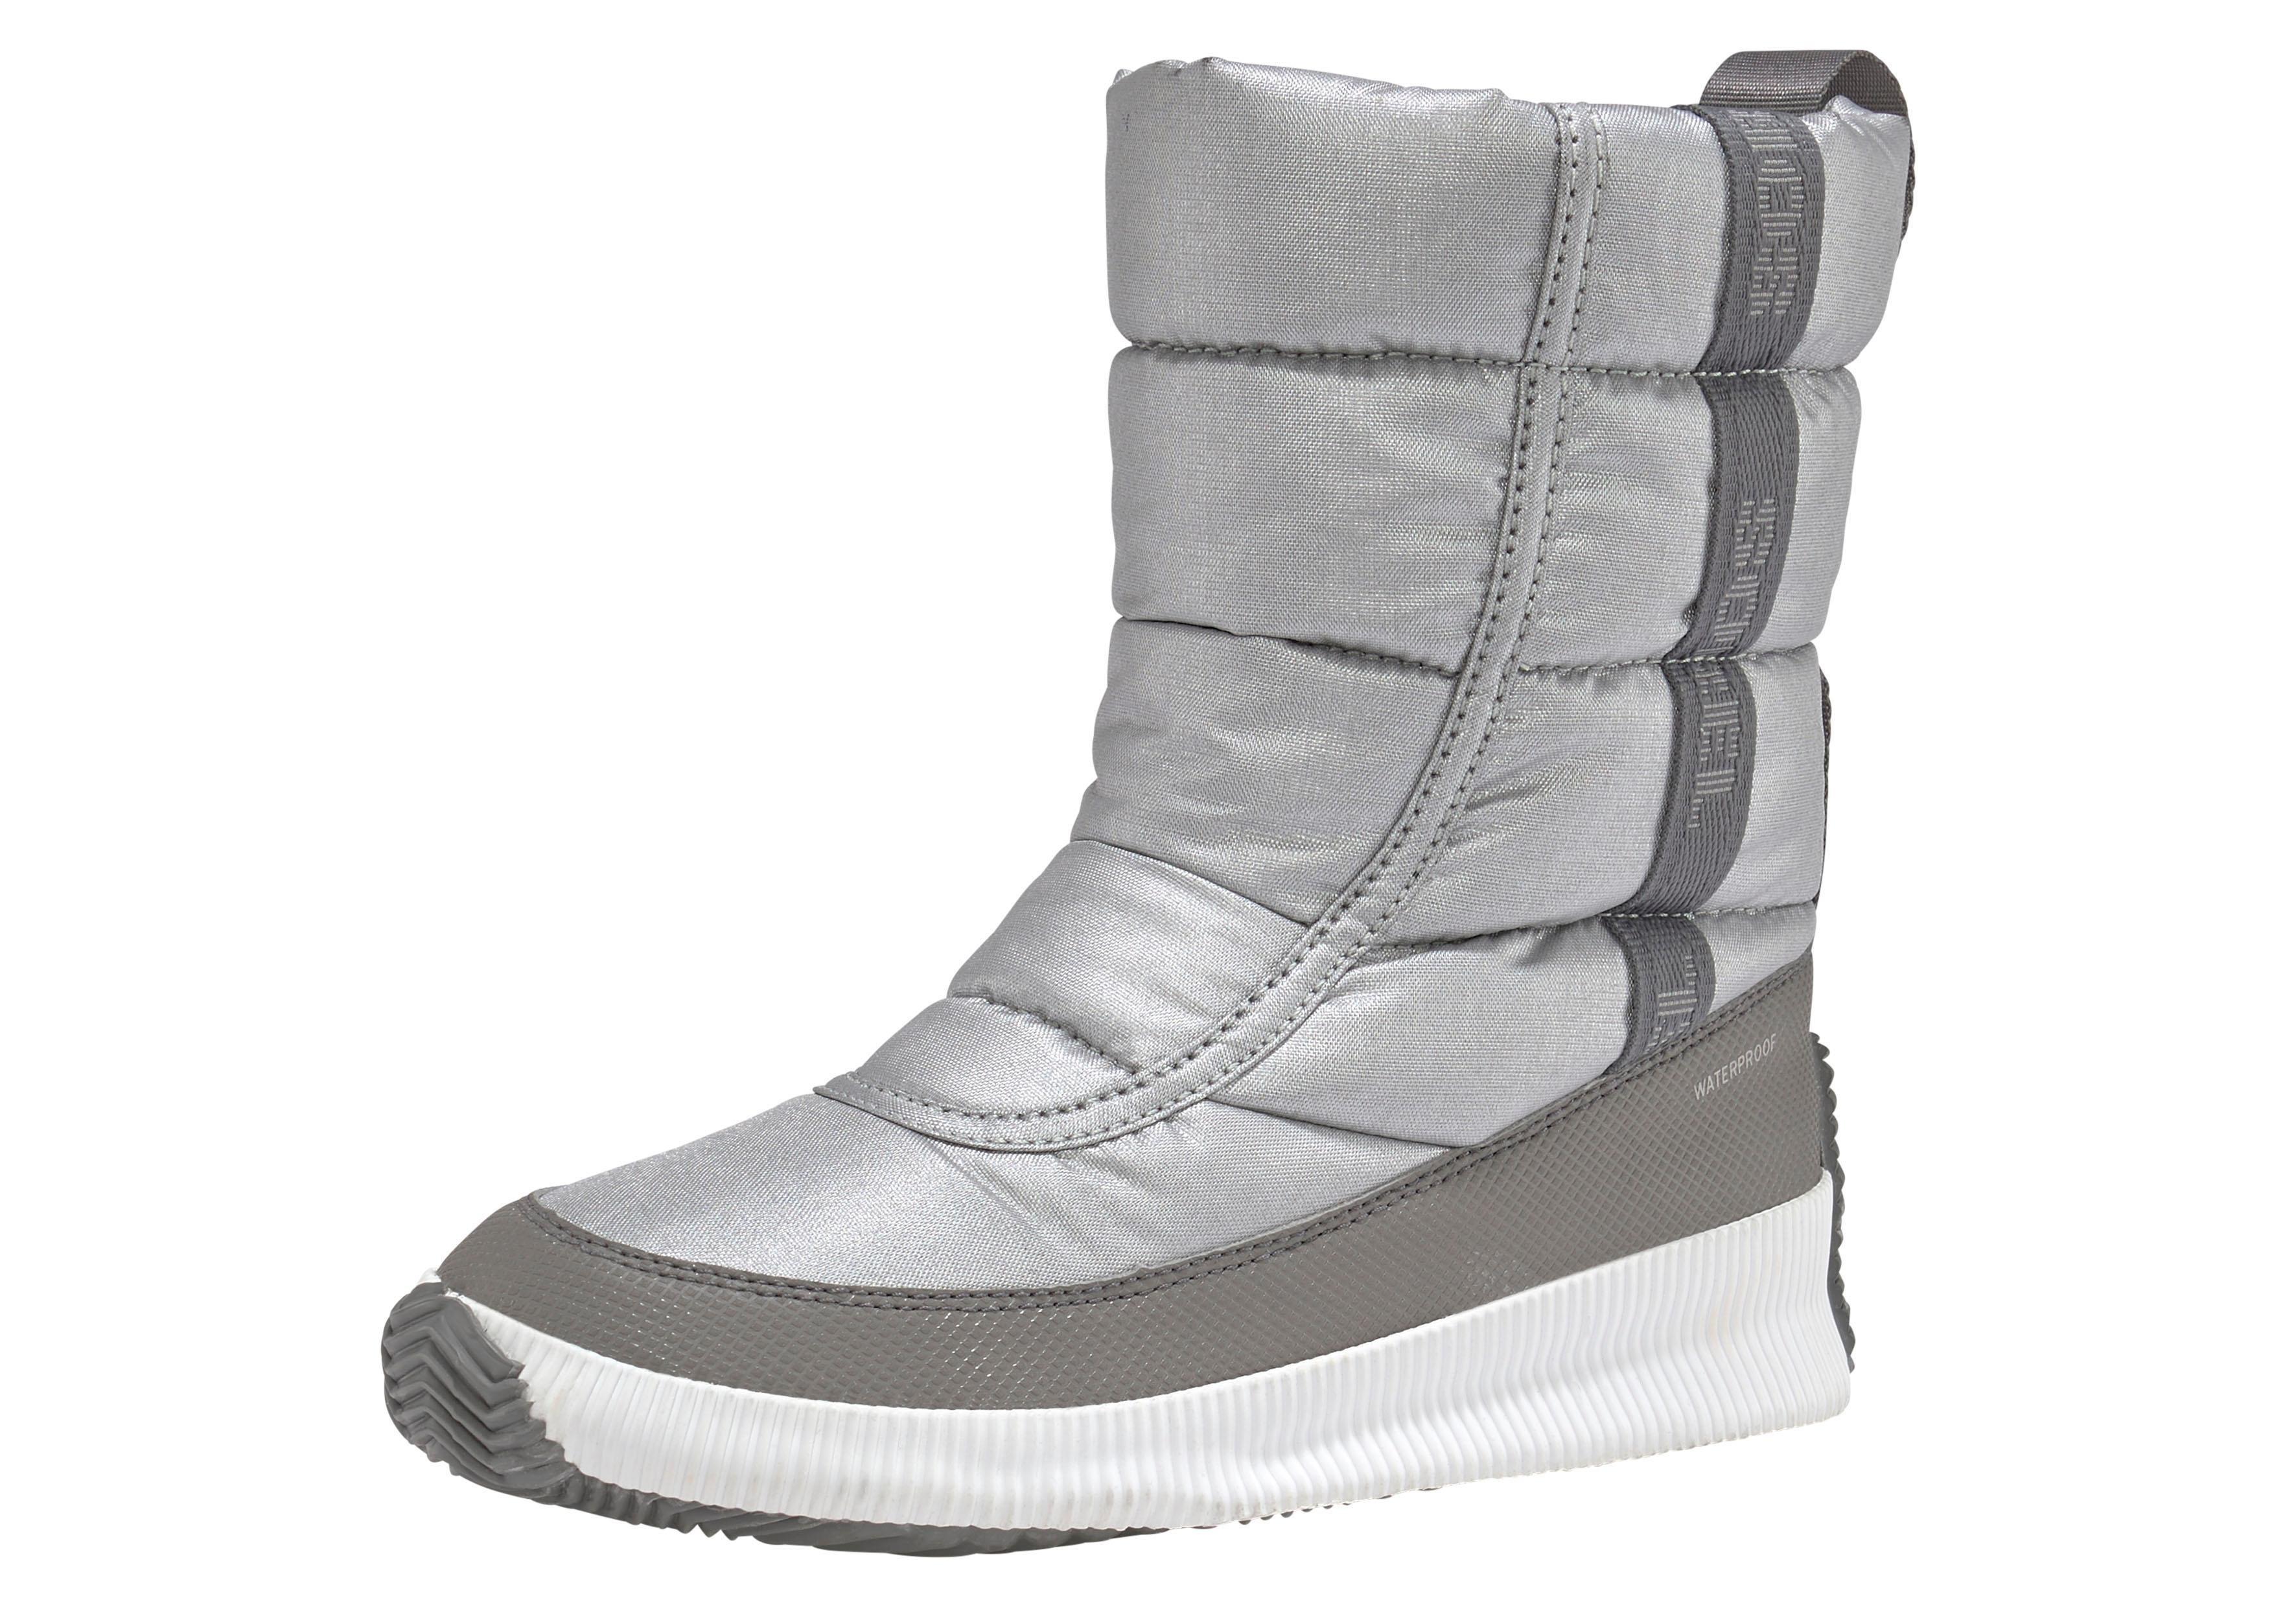 Sorel laarzen zonder sluiting »OUT N ABOUT™ PUFFY MID« veilig op otto.nl kopen